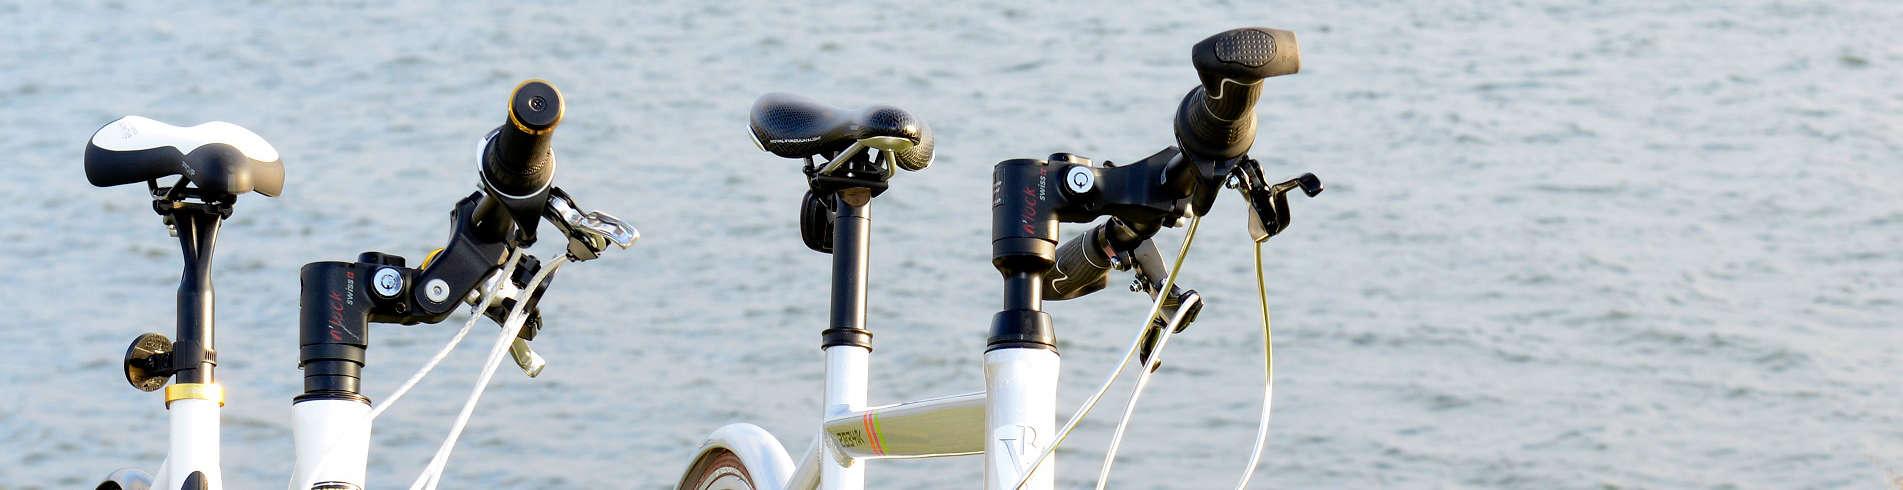 banner-cykel-forside-4